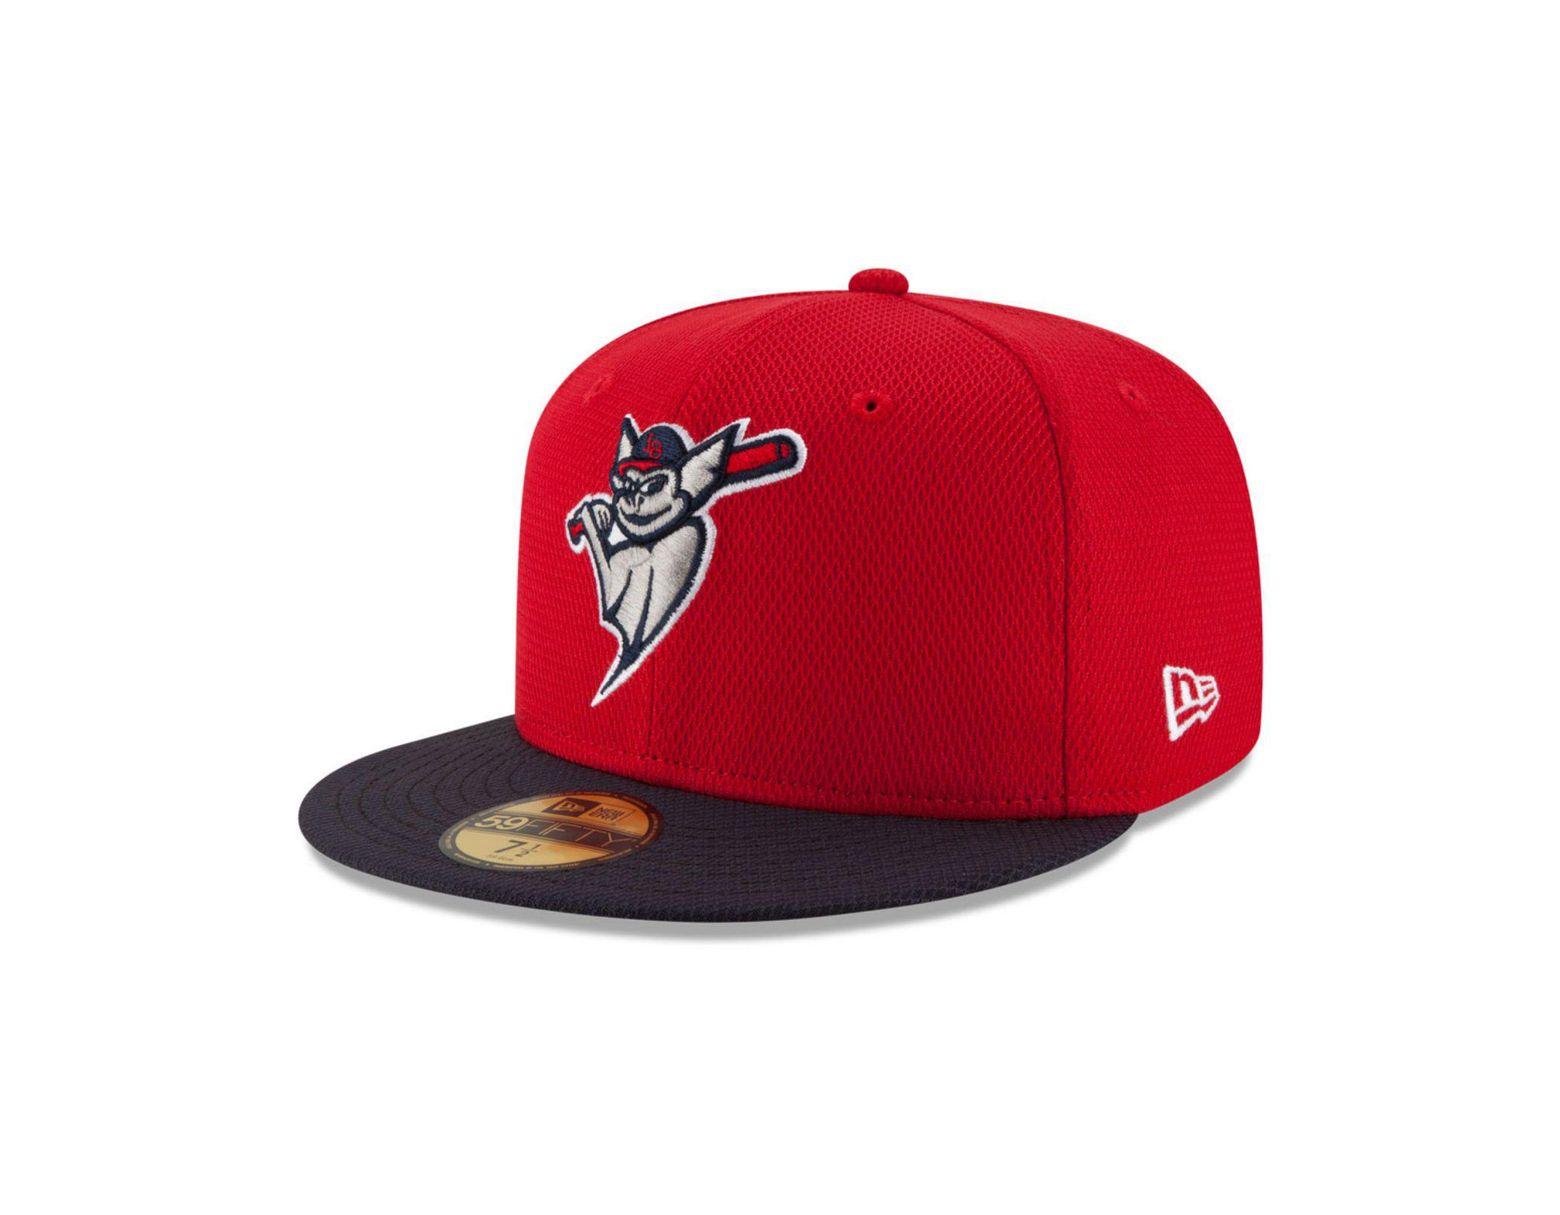 new styles e6313 cba1b KTZ Louisville Bats Ac 59fifty Cap in Red for Men - Lyst